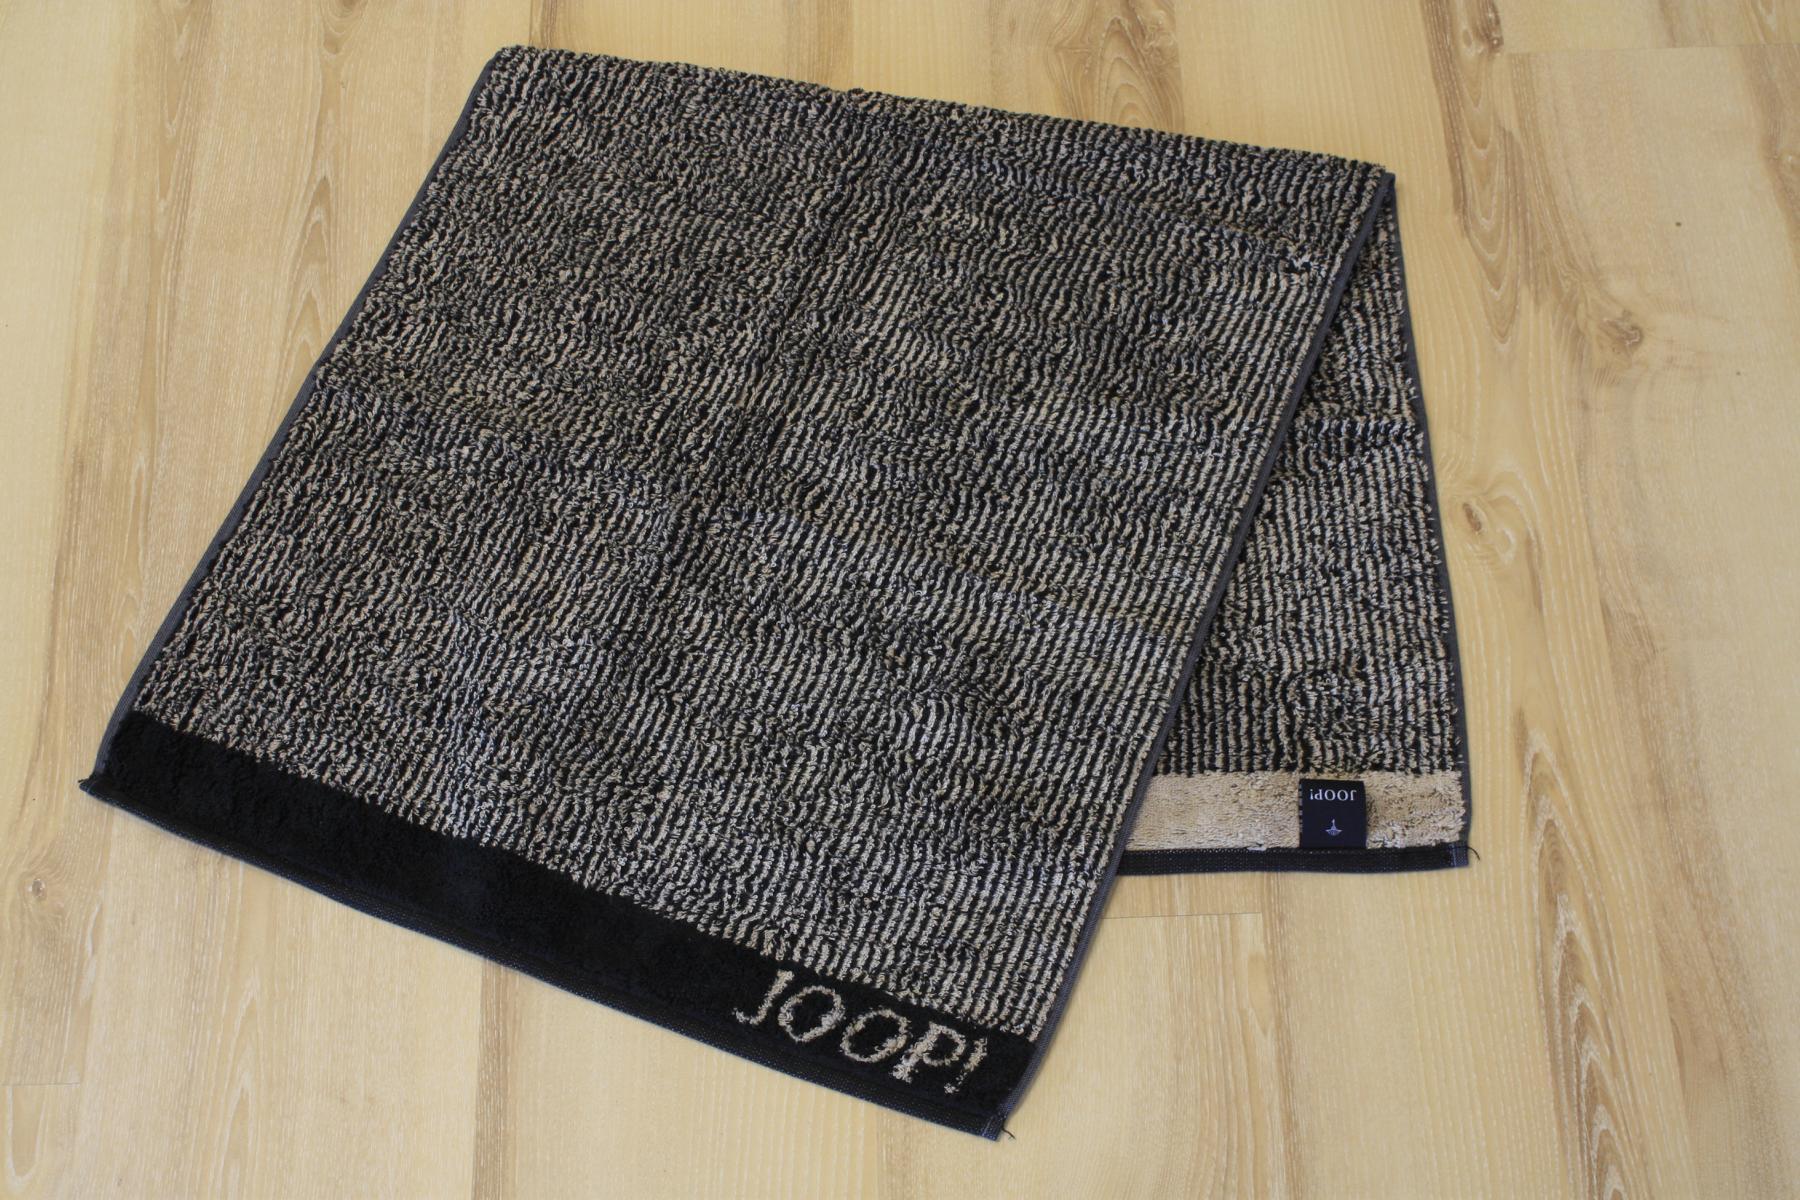 joop duschtuch badetuch 1652 stripes 93 schwarz 80x150cm ebay. Black Bedroom Furniture Sets. Home Design Ideas